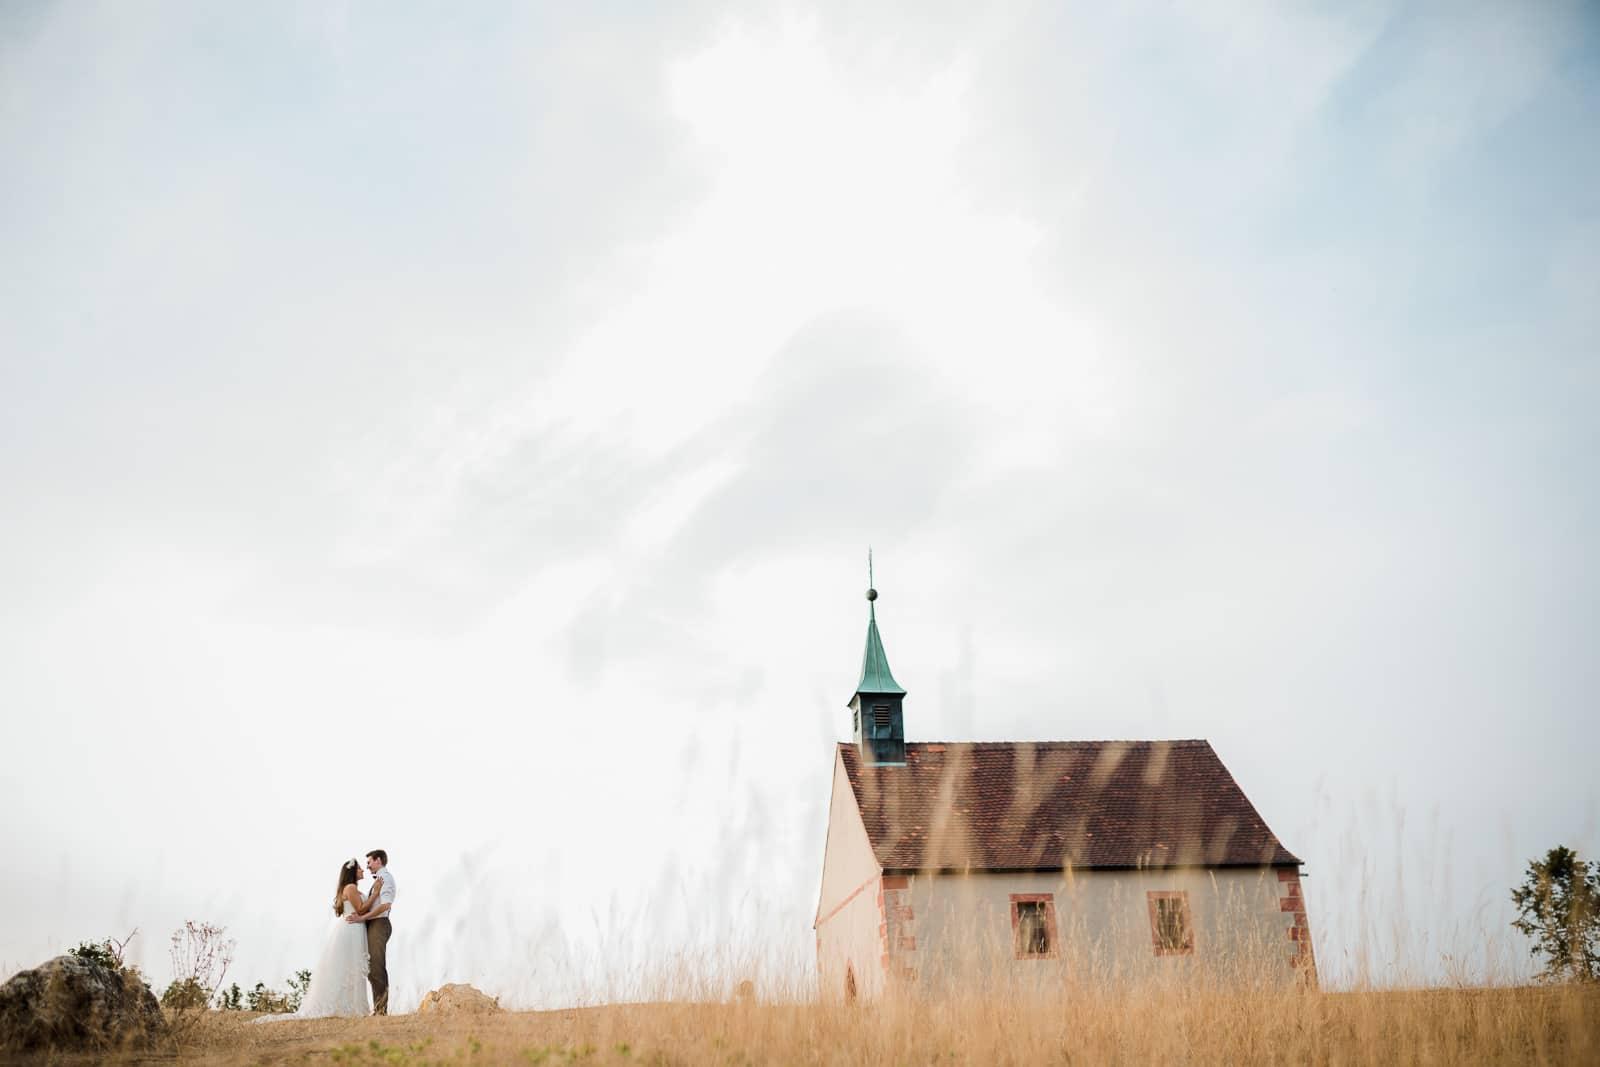 fotógrafo brasileiro na Alemanha